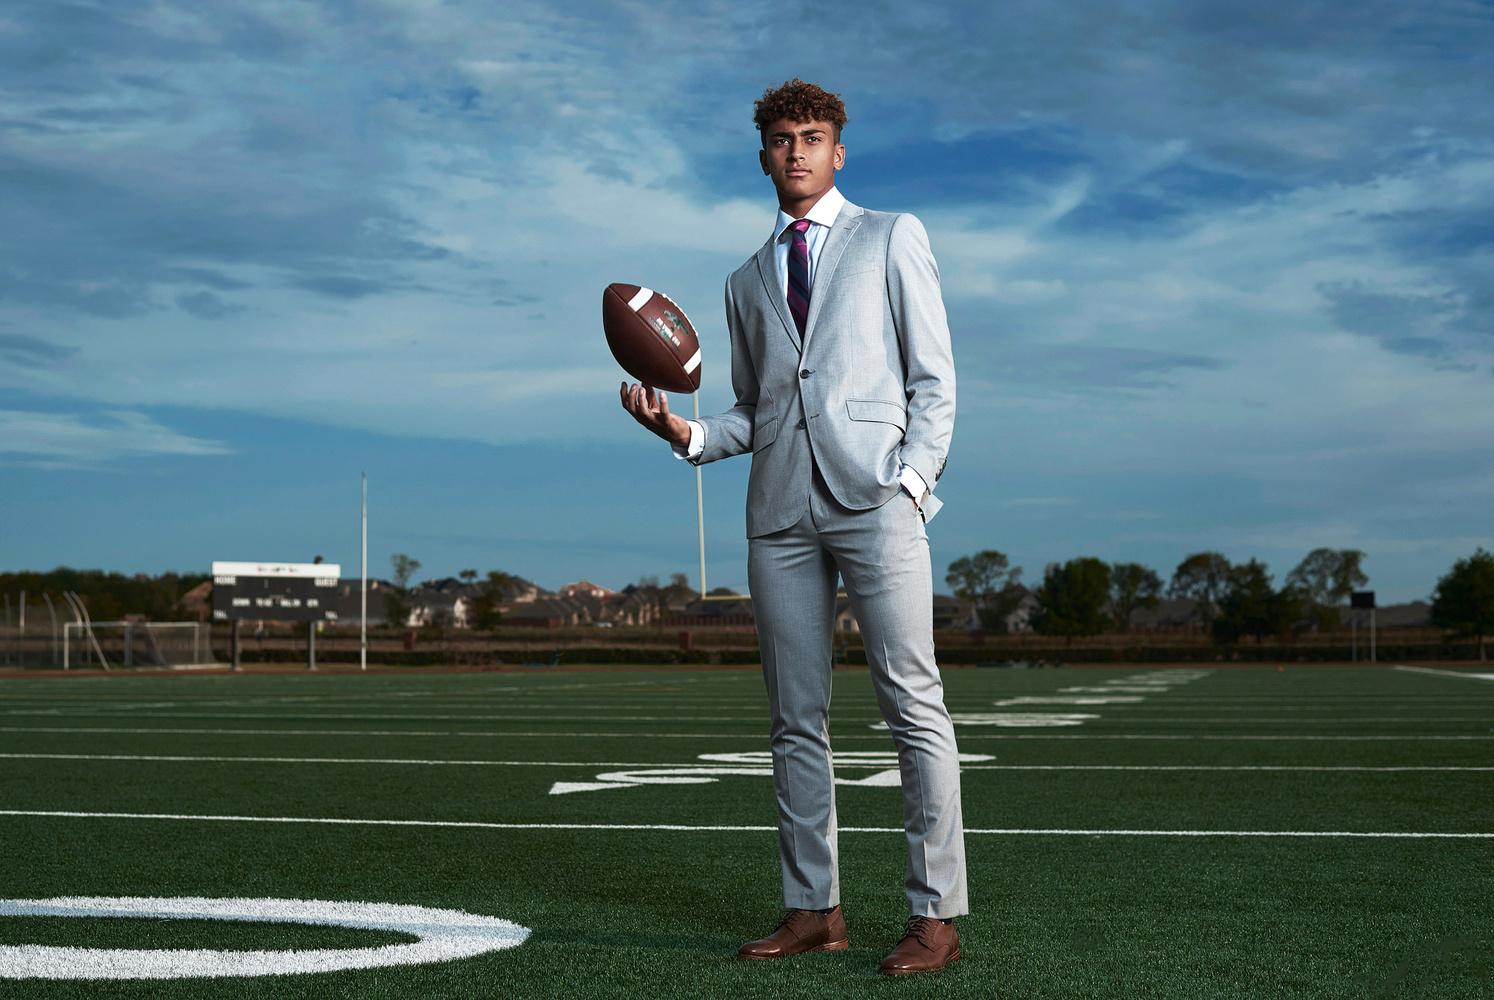 High School Sports Fashion Portraits - Football by JEFF Dietz